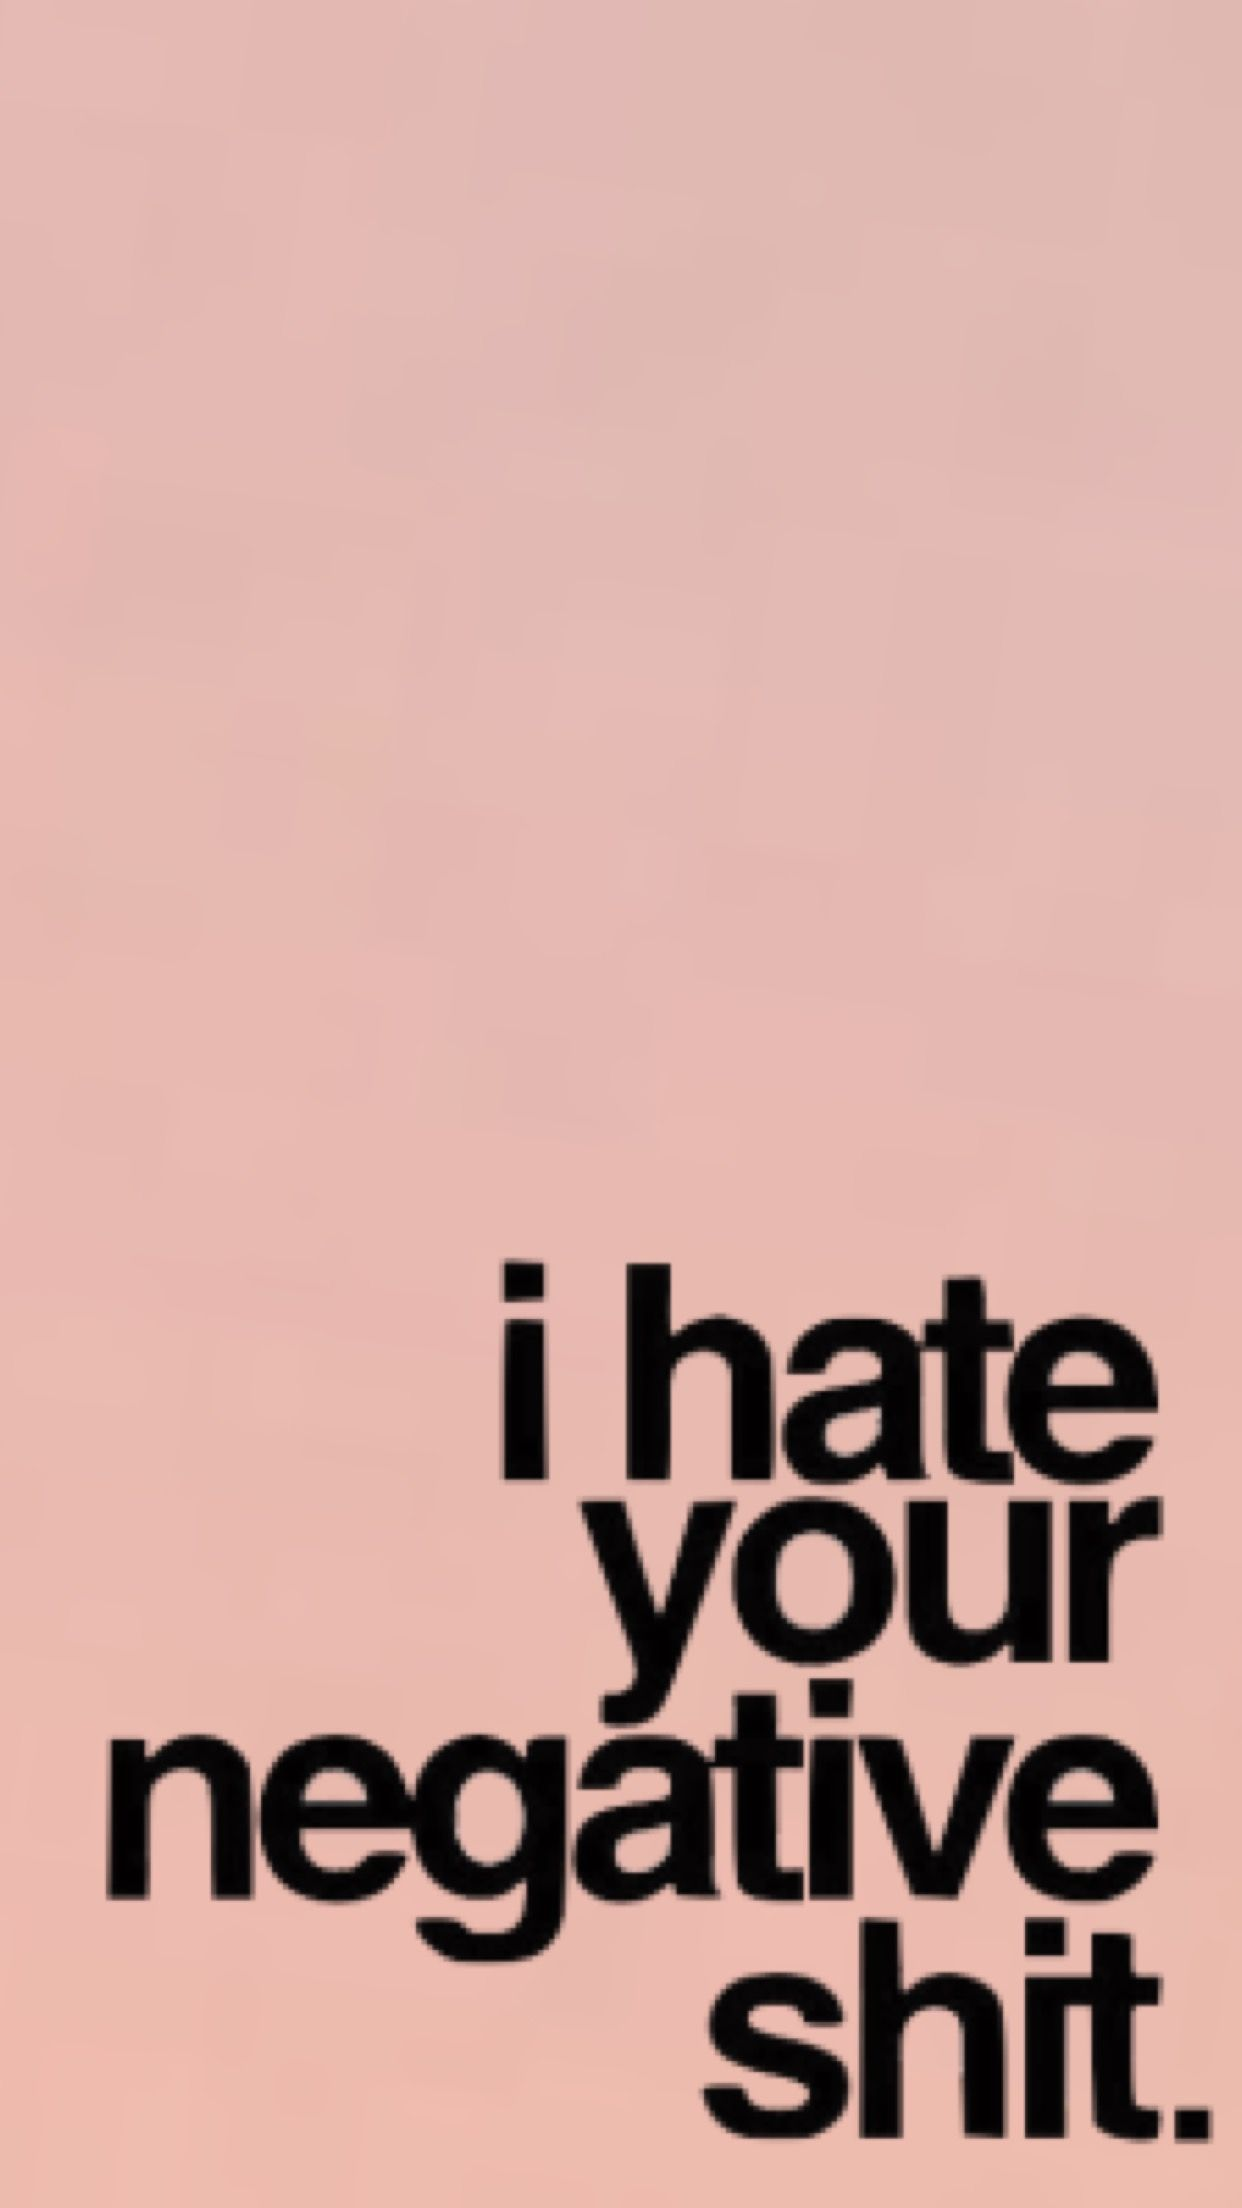 X files iphone wallpaper tumblr - I Hate Your Negative Shit Wallpaper Made By Laurette Instagram Laurette_evonen